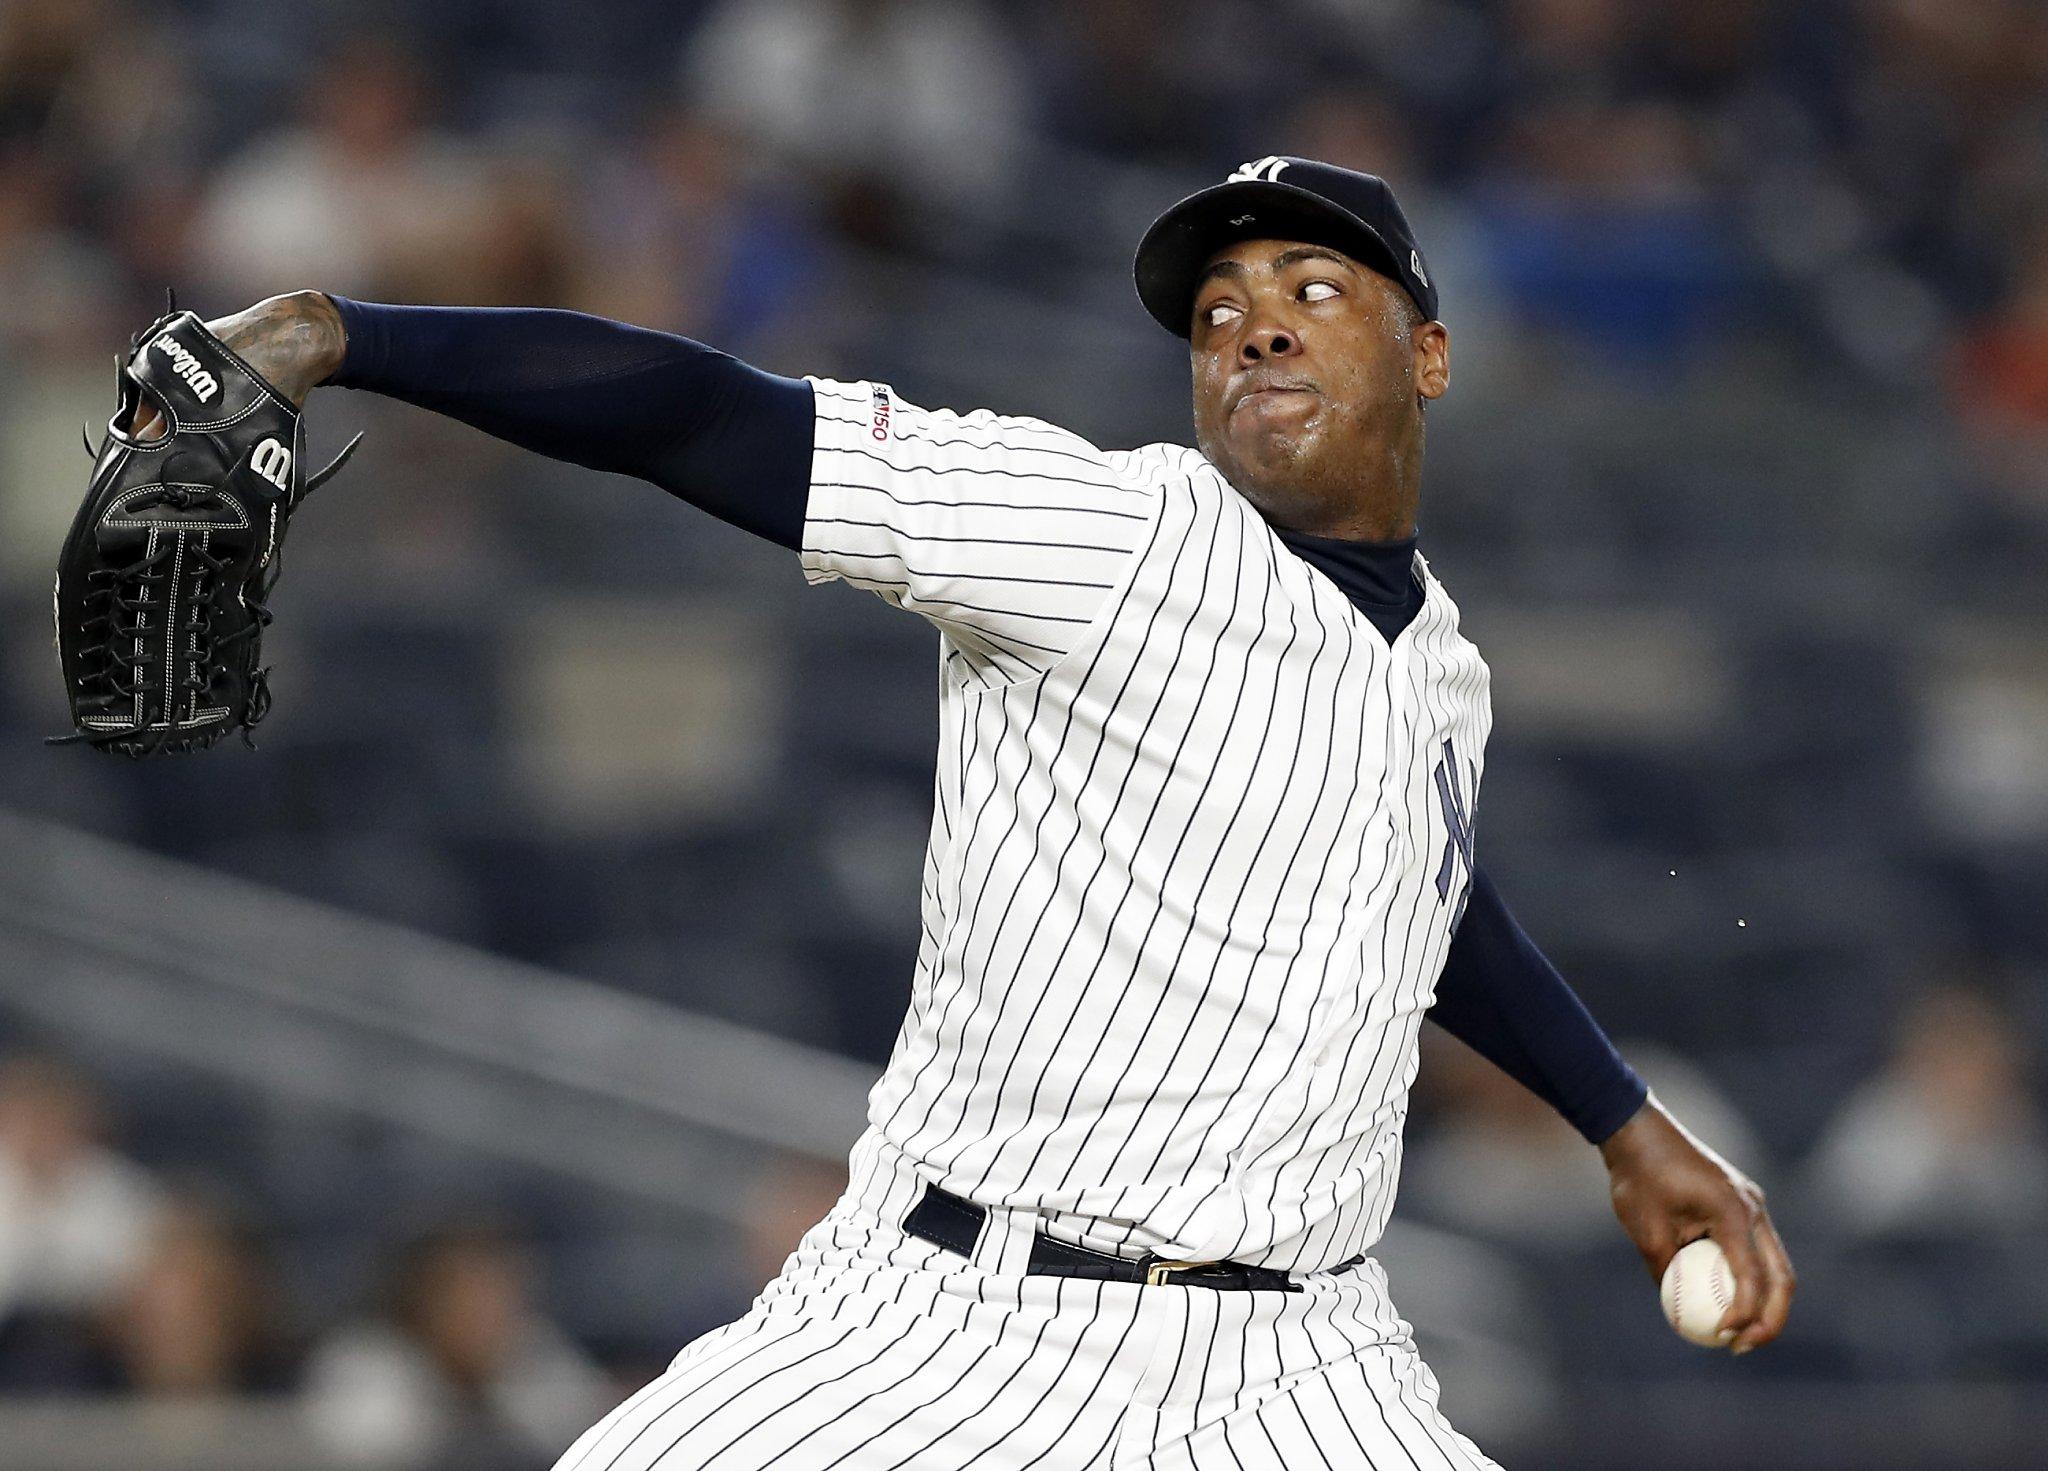 Yankees closer Chapman has coronavirus; Judge scratched